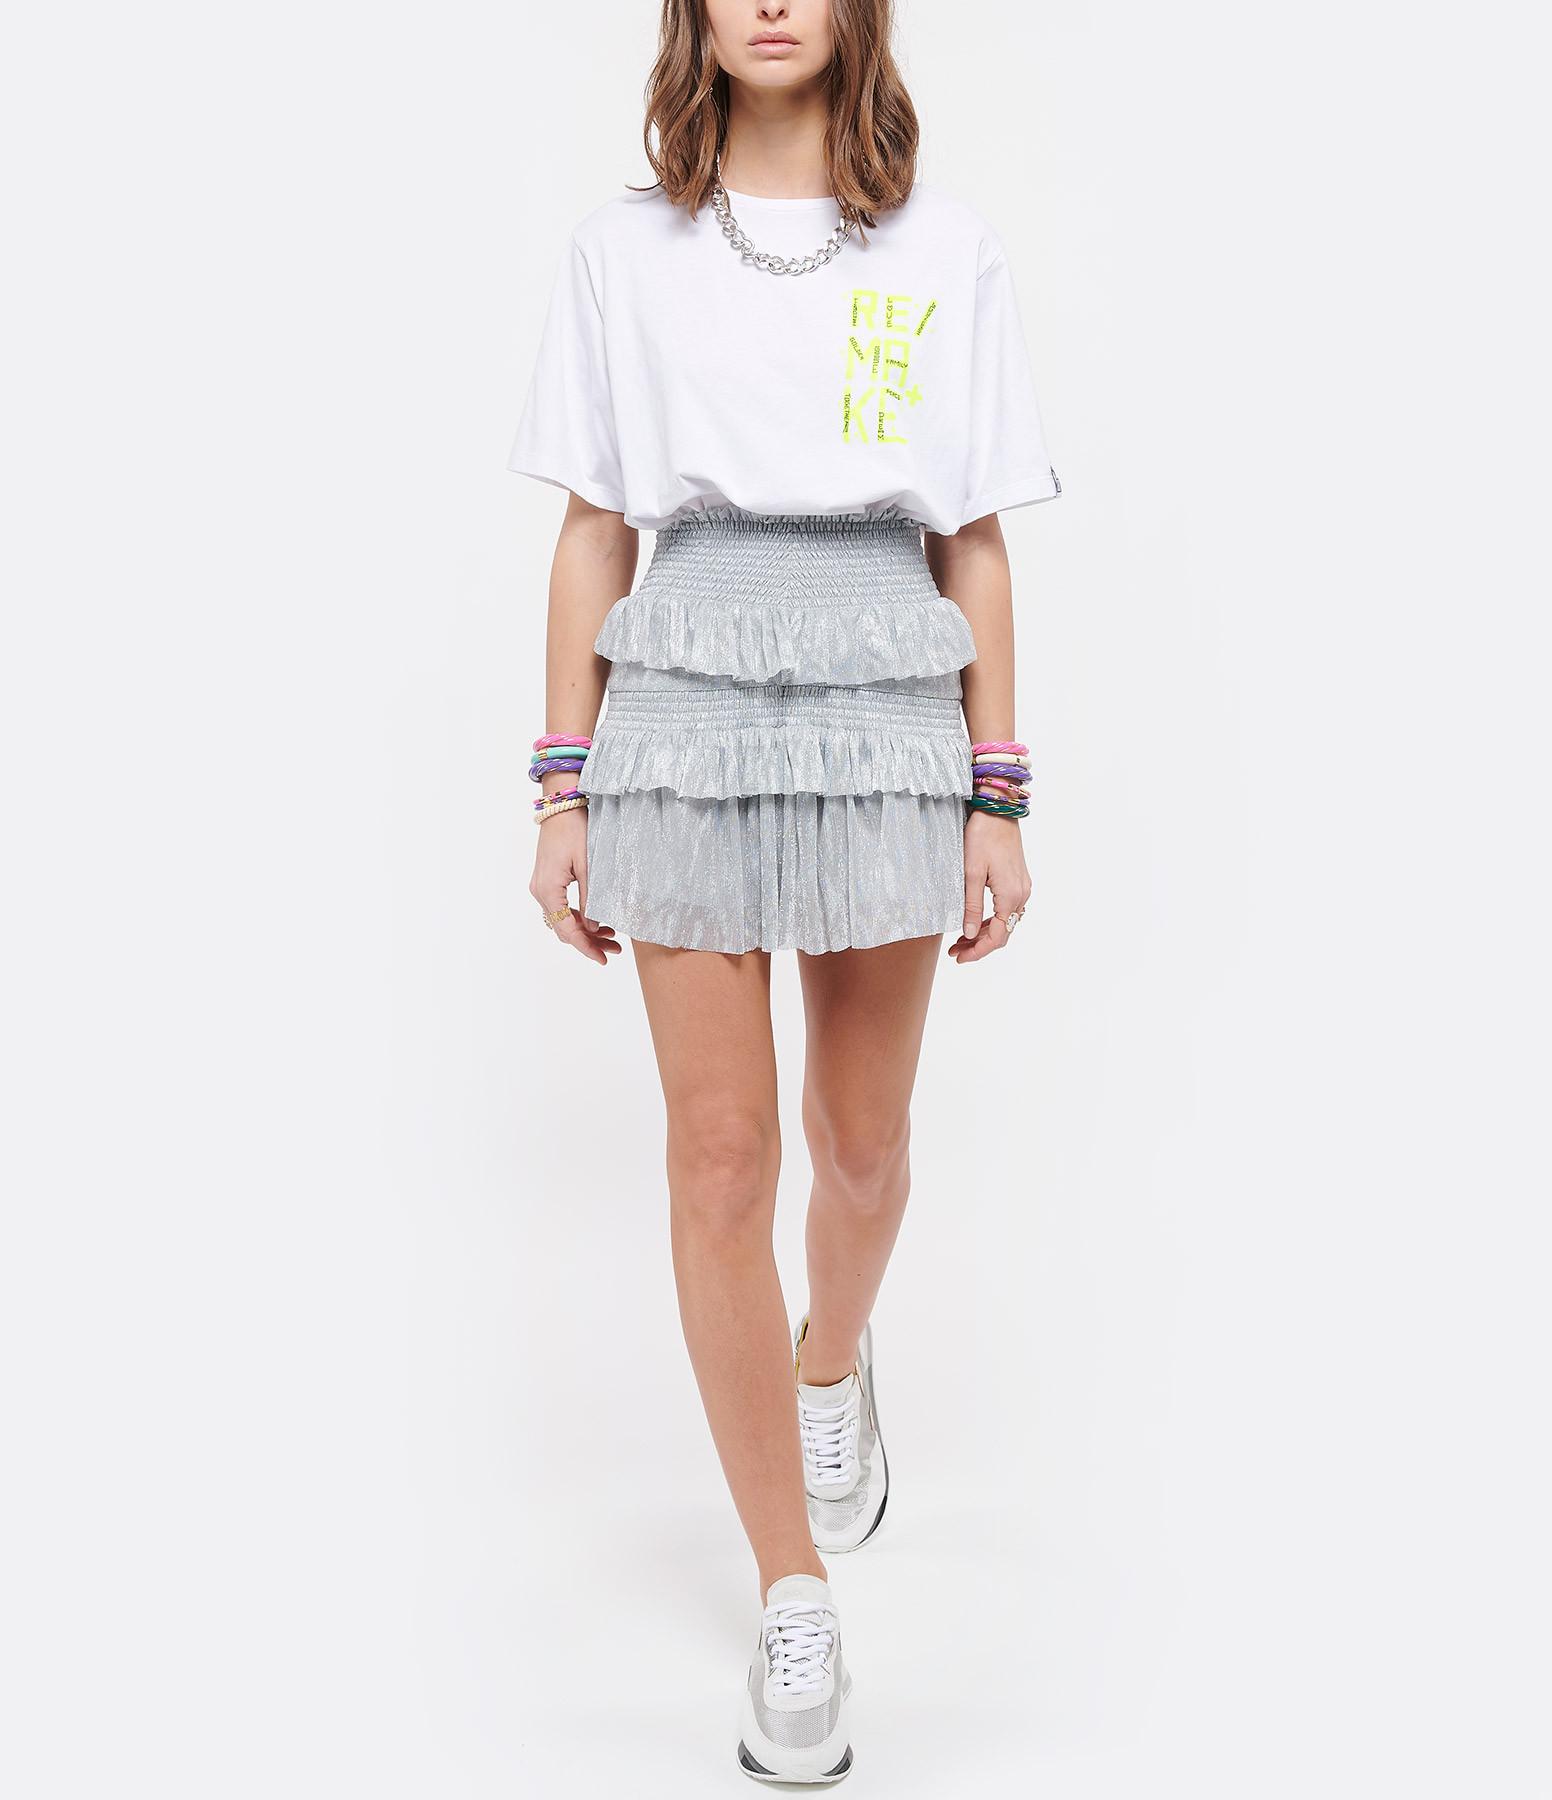 GOLDEN GOOSE - Tee-shirt Aira Remake Coton Blanc